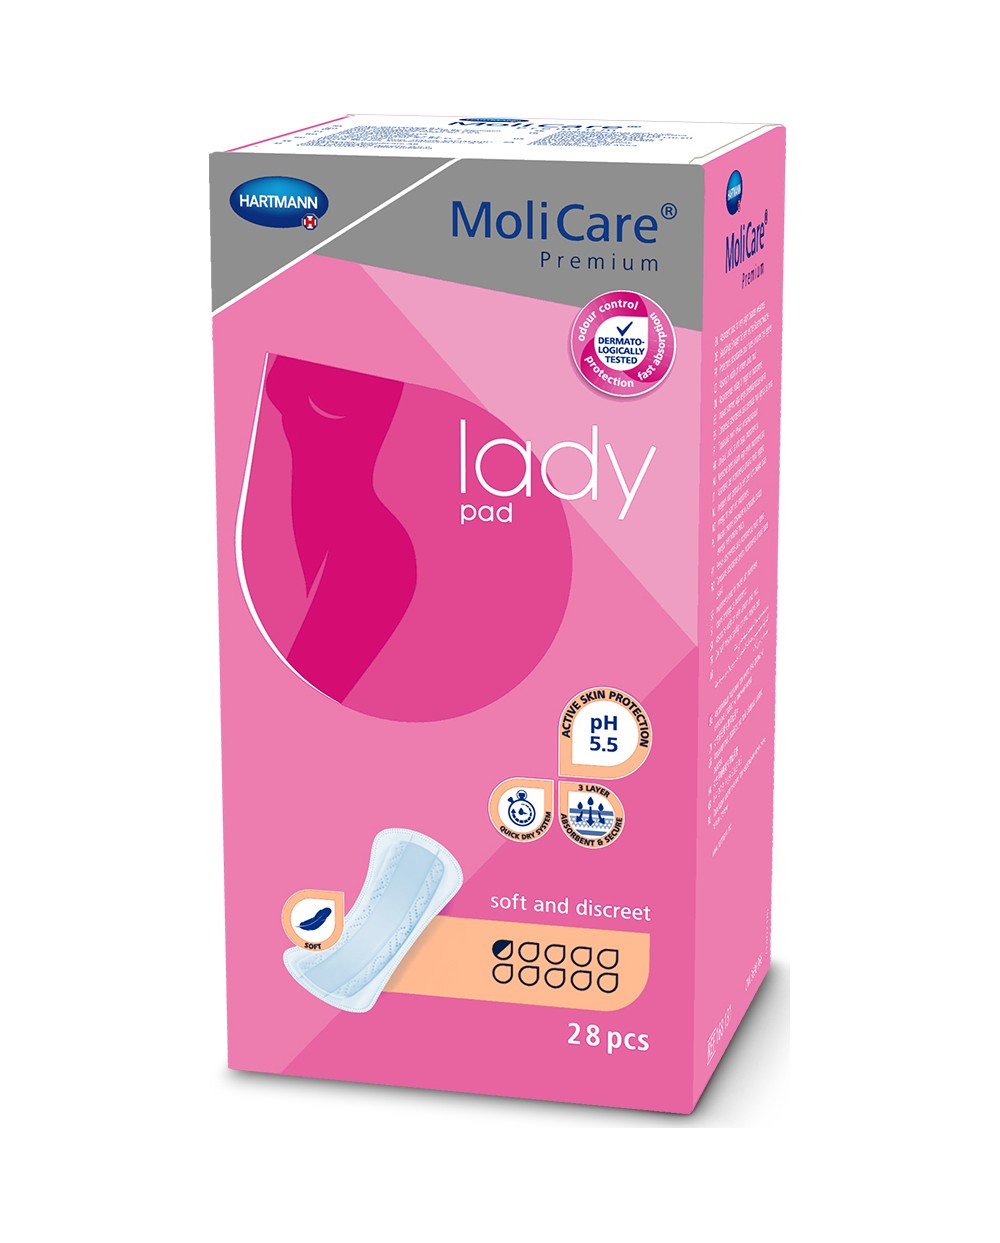 Hartmann Molicare Premium Lady Pads 0.5 goutte - 28 protections